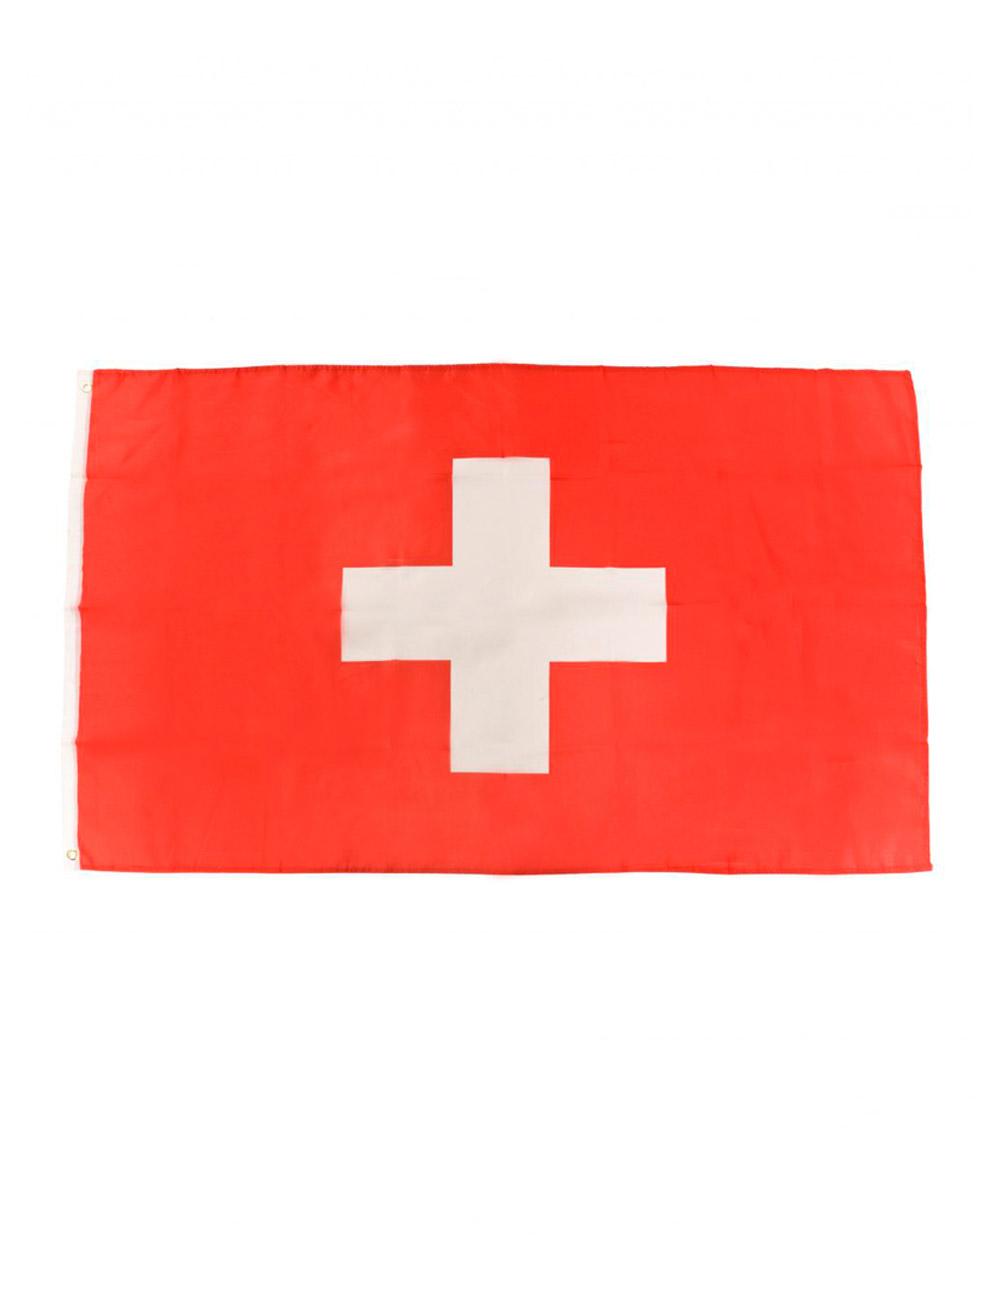 Flagge Schweiz 90x60cm Farbe: rot/weiss